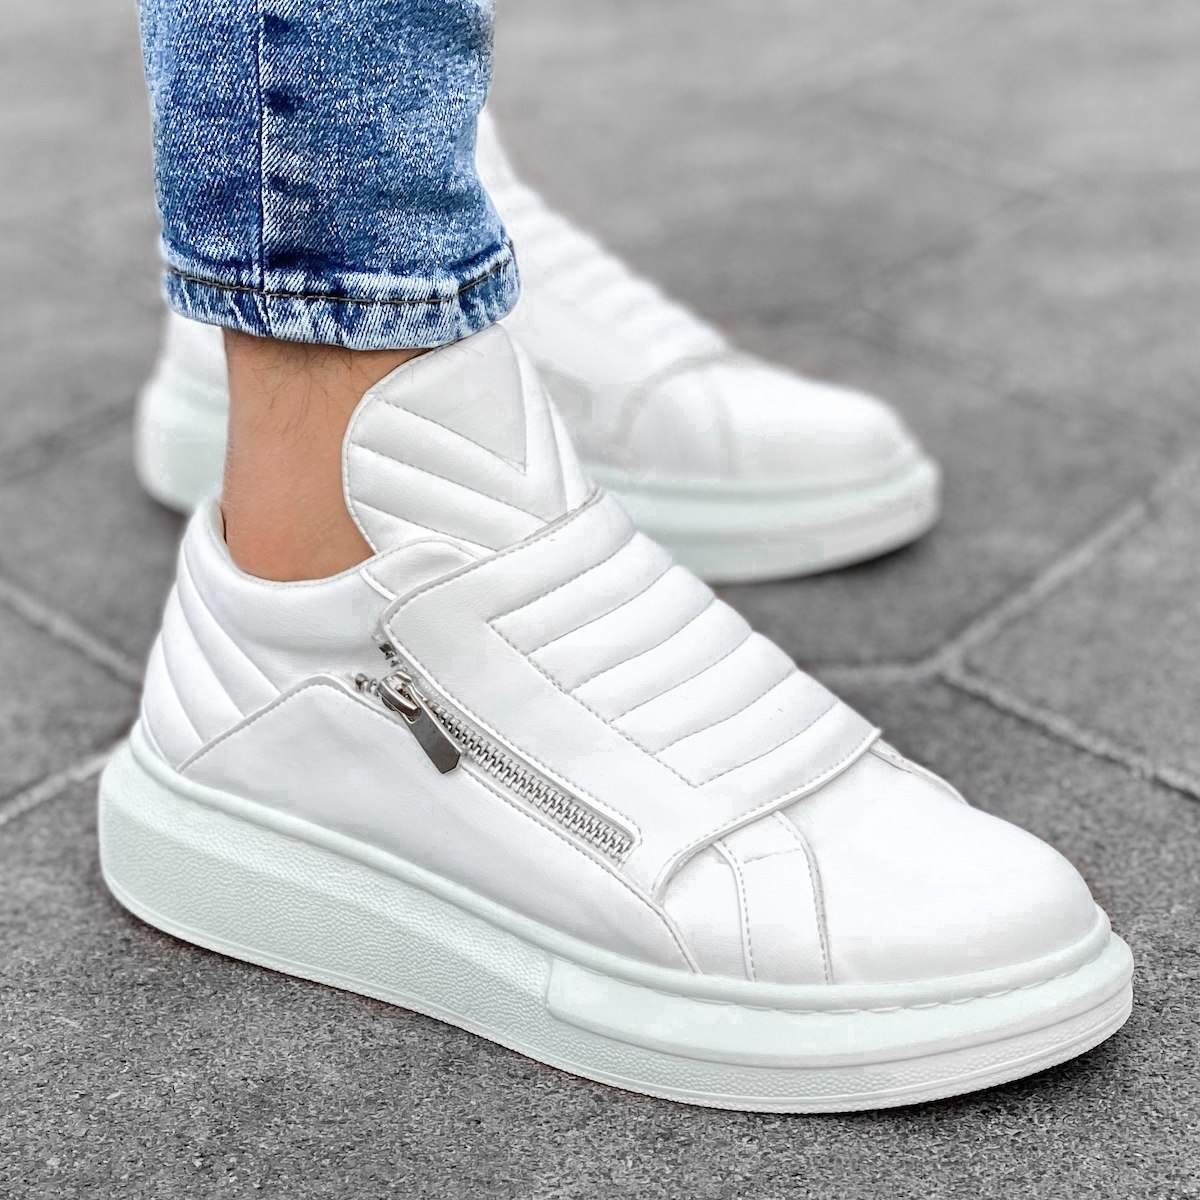 Homem Sola Alta Casual Designer Sneakers Basket Branco